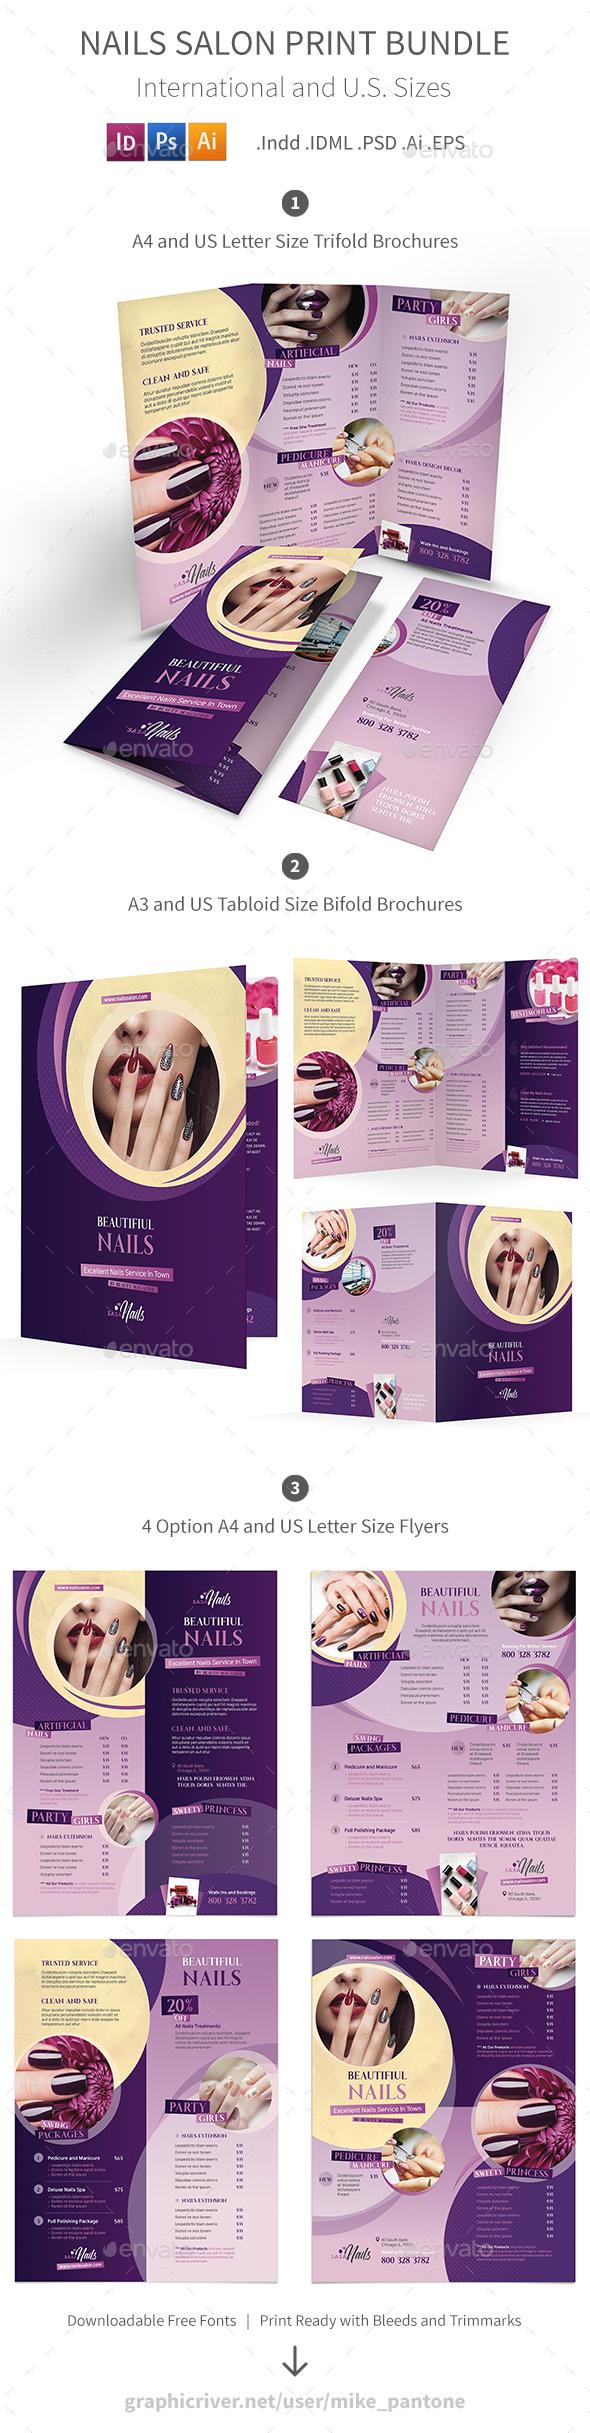 Nails Salon Print Bundle - Informational Brochures